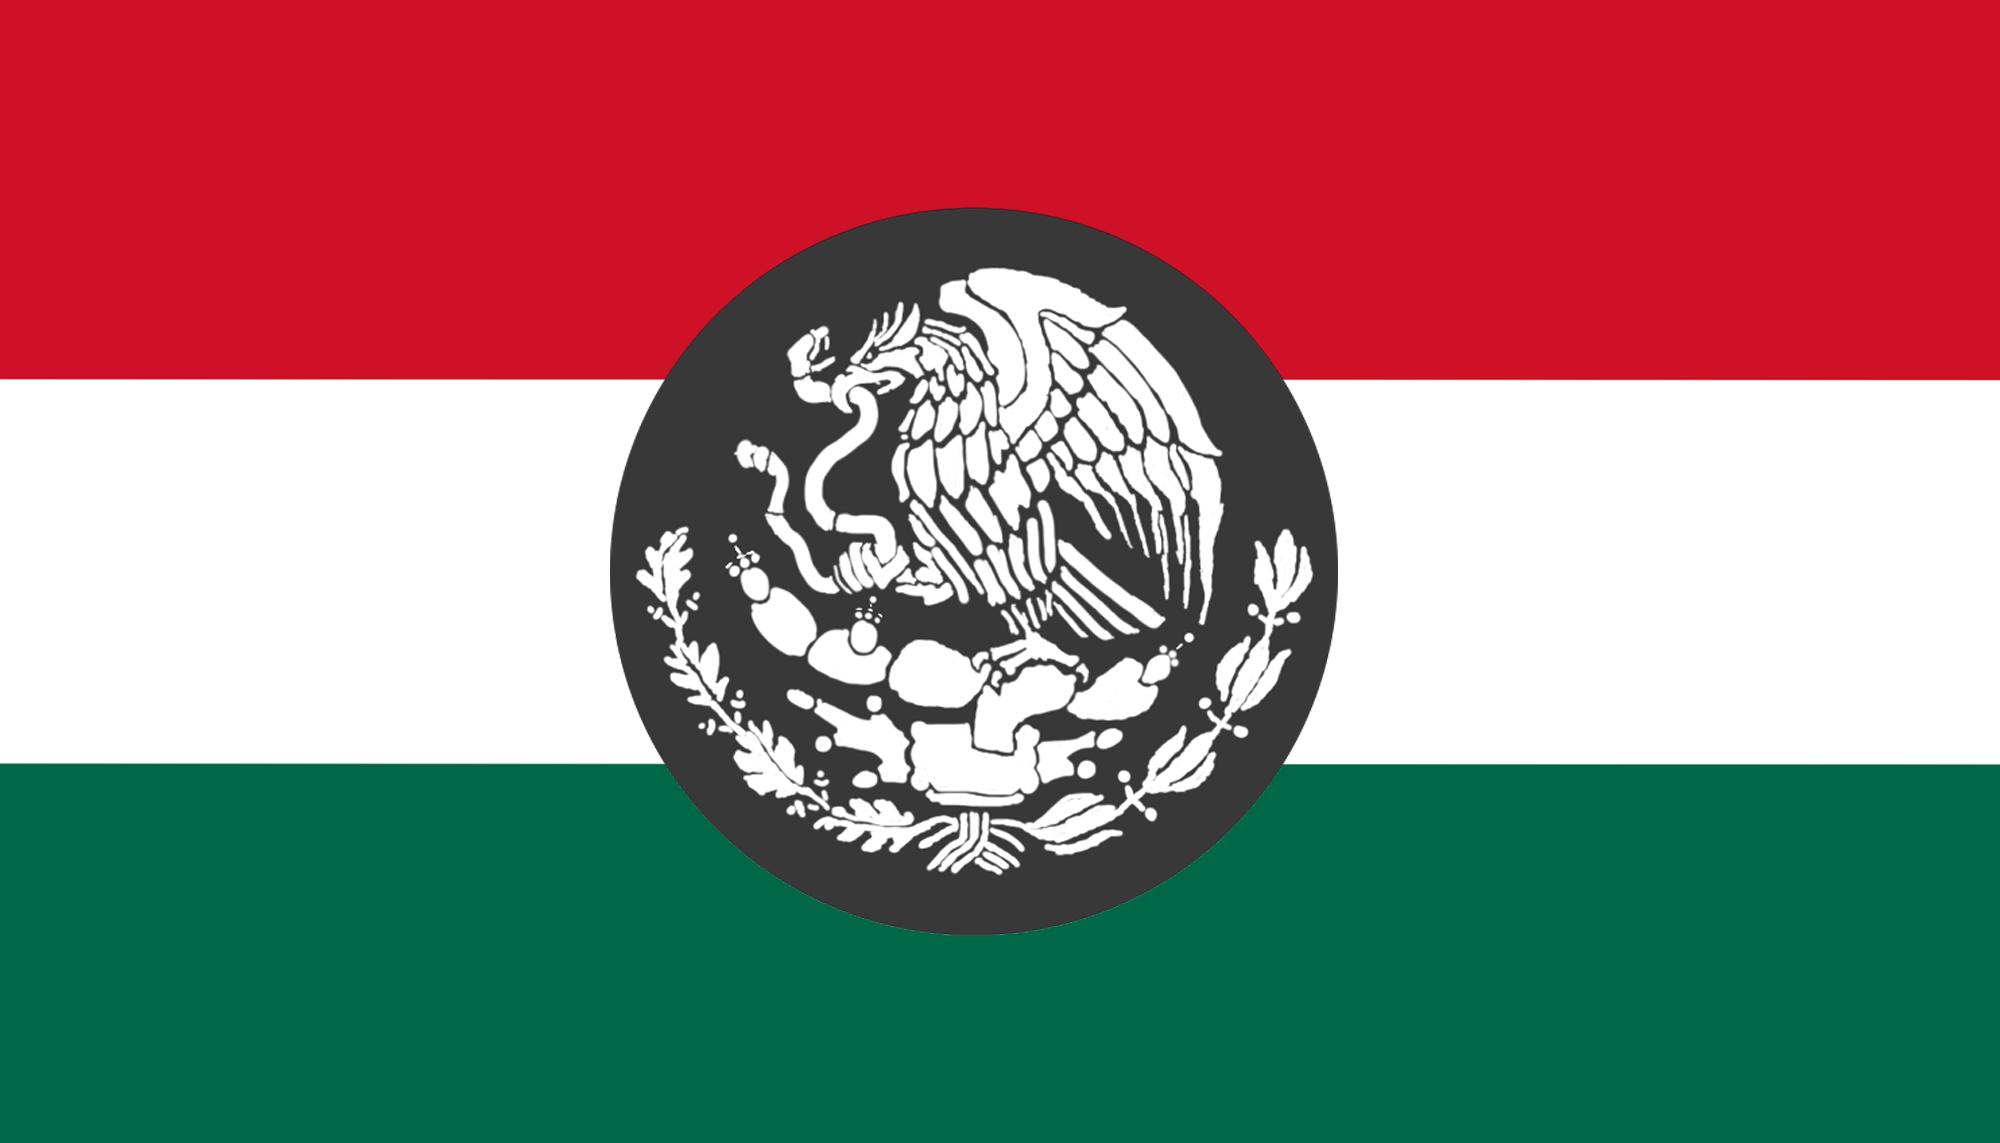 Alternate Flag Of Mexico In 2020 Mexico Flag Flag Mexico